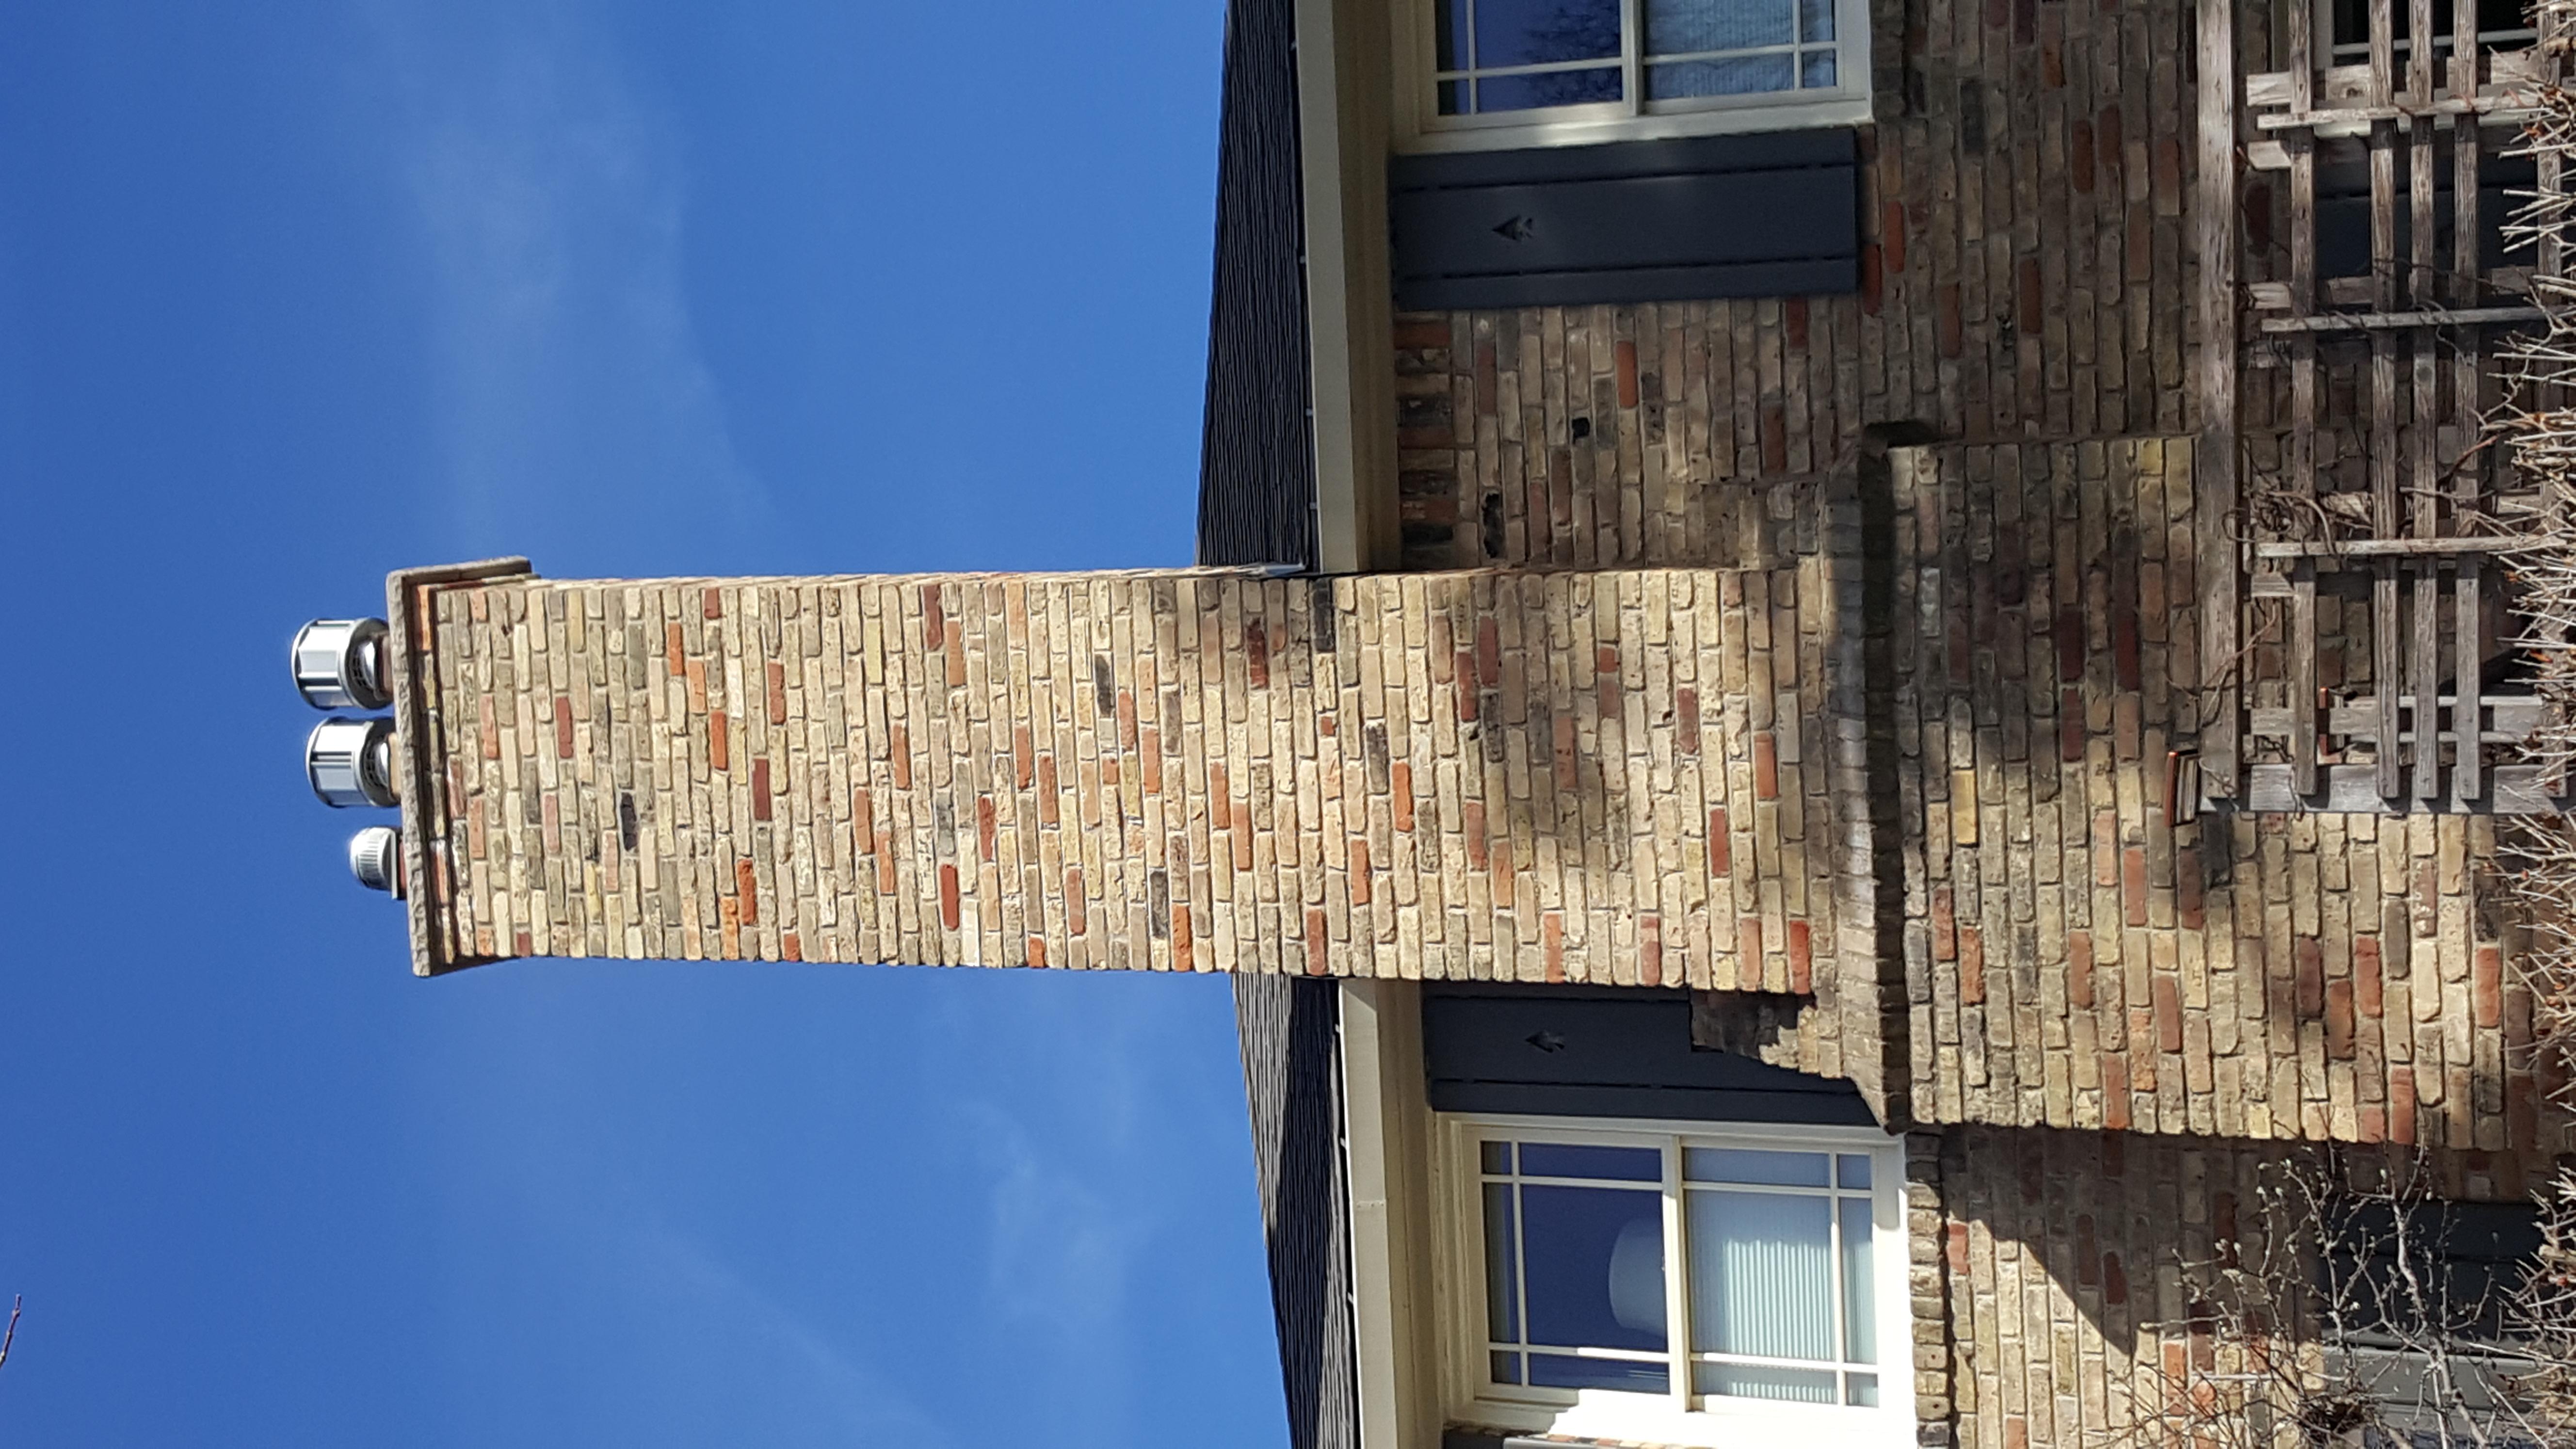 Brick Chimneys (56)